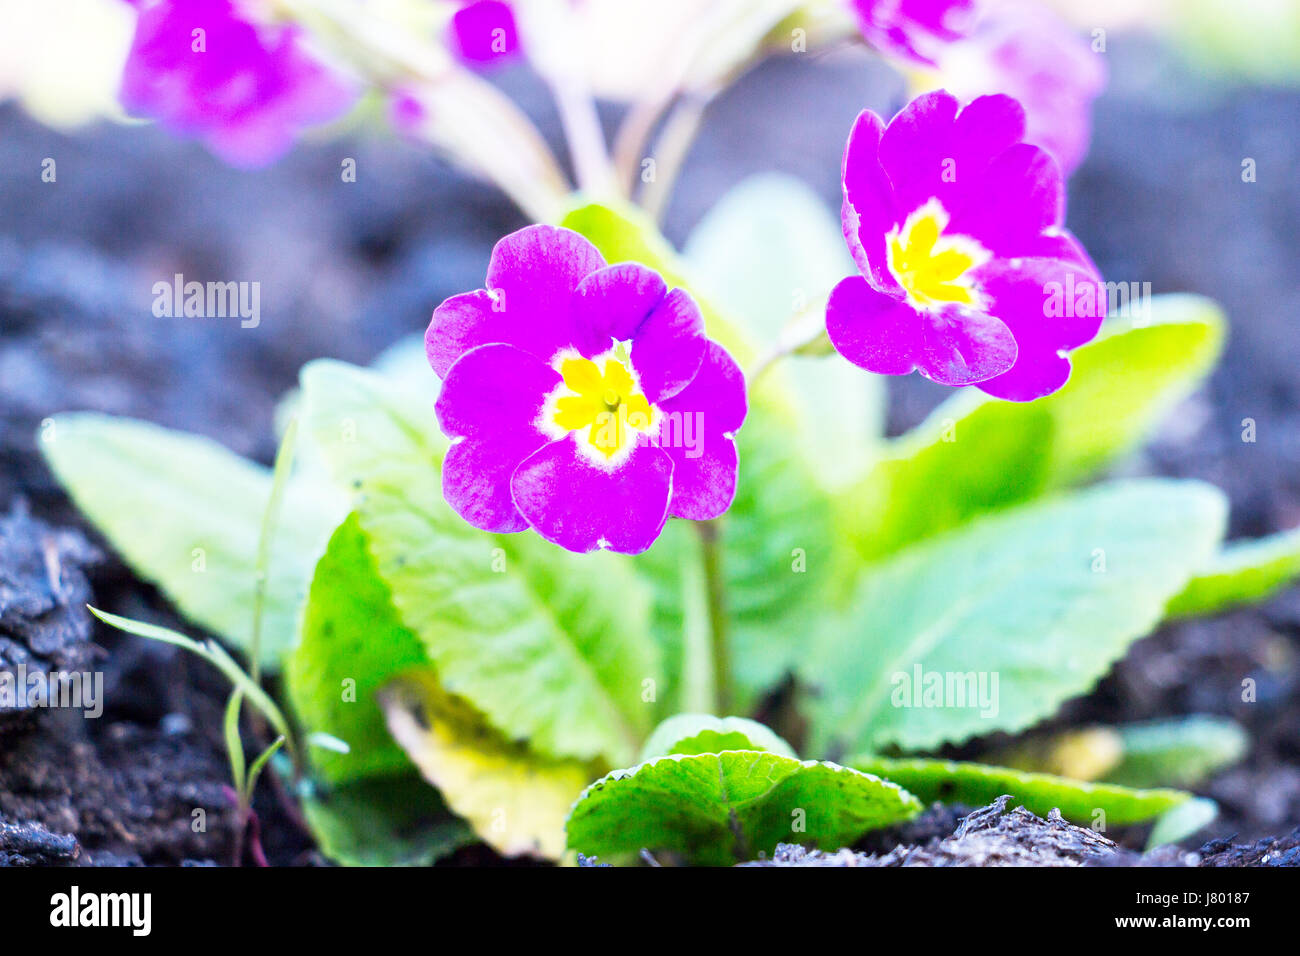 Flowers of Primula juliae - Stock Image